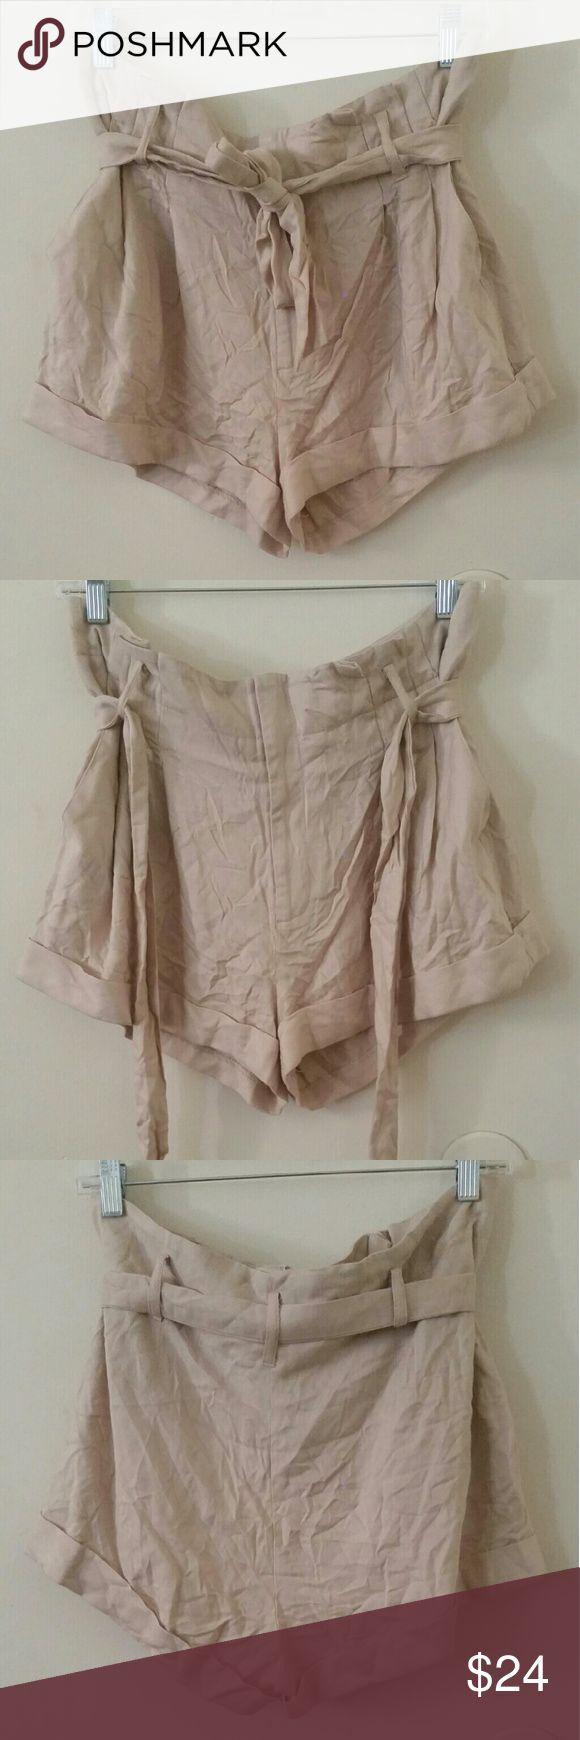 Cream shorts New shorts/ Never worn  Size 12 Cream shorts with belt. Sparkle & Fade Shorts